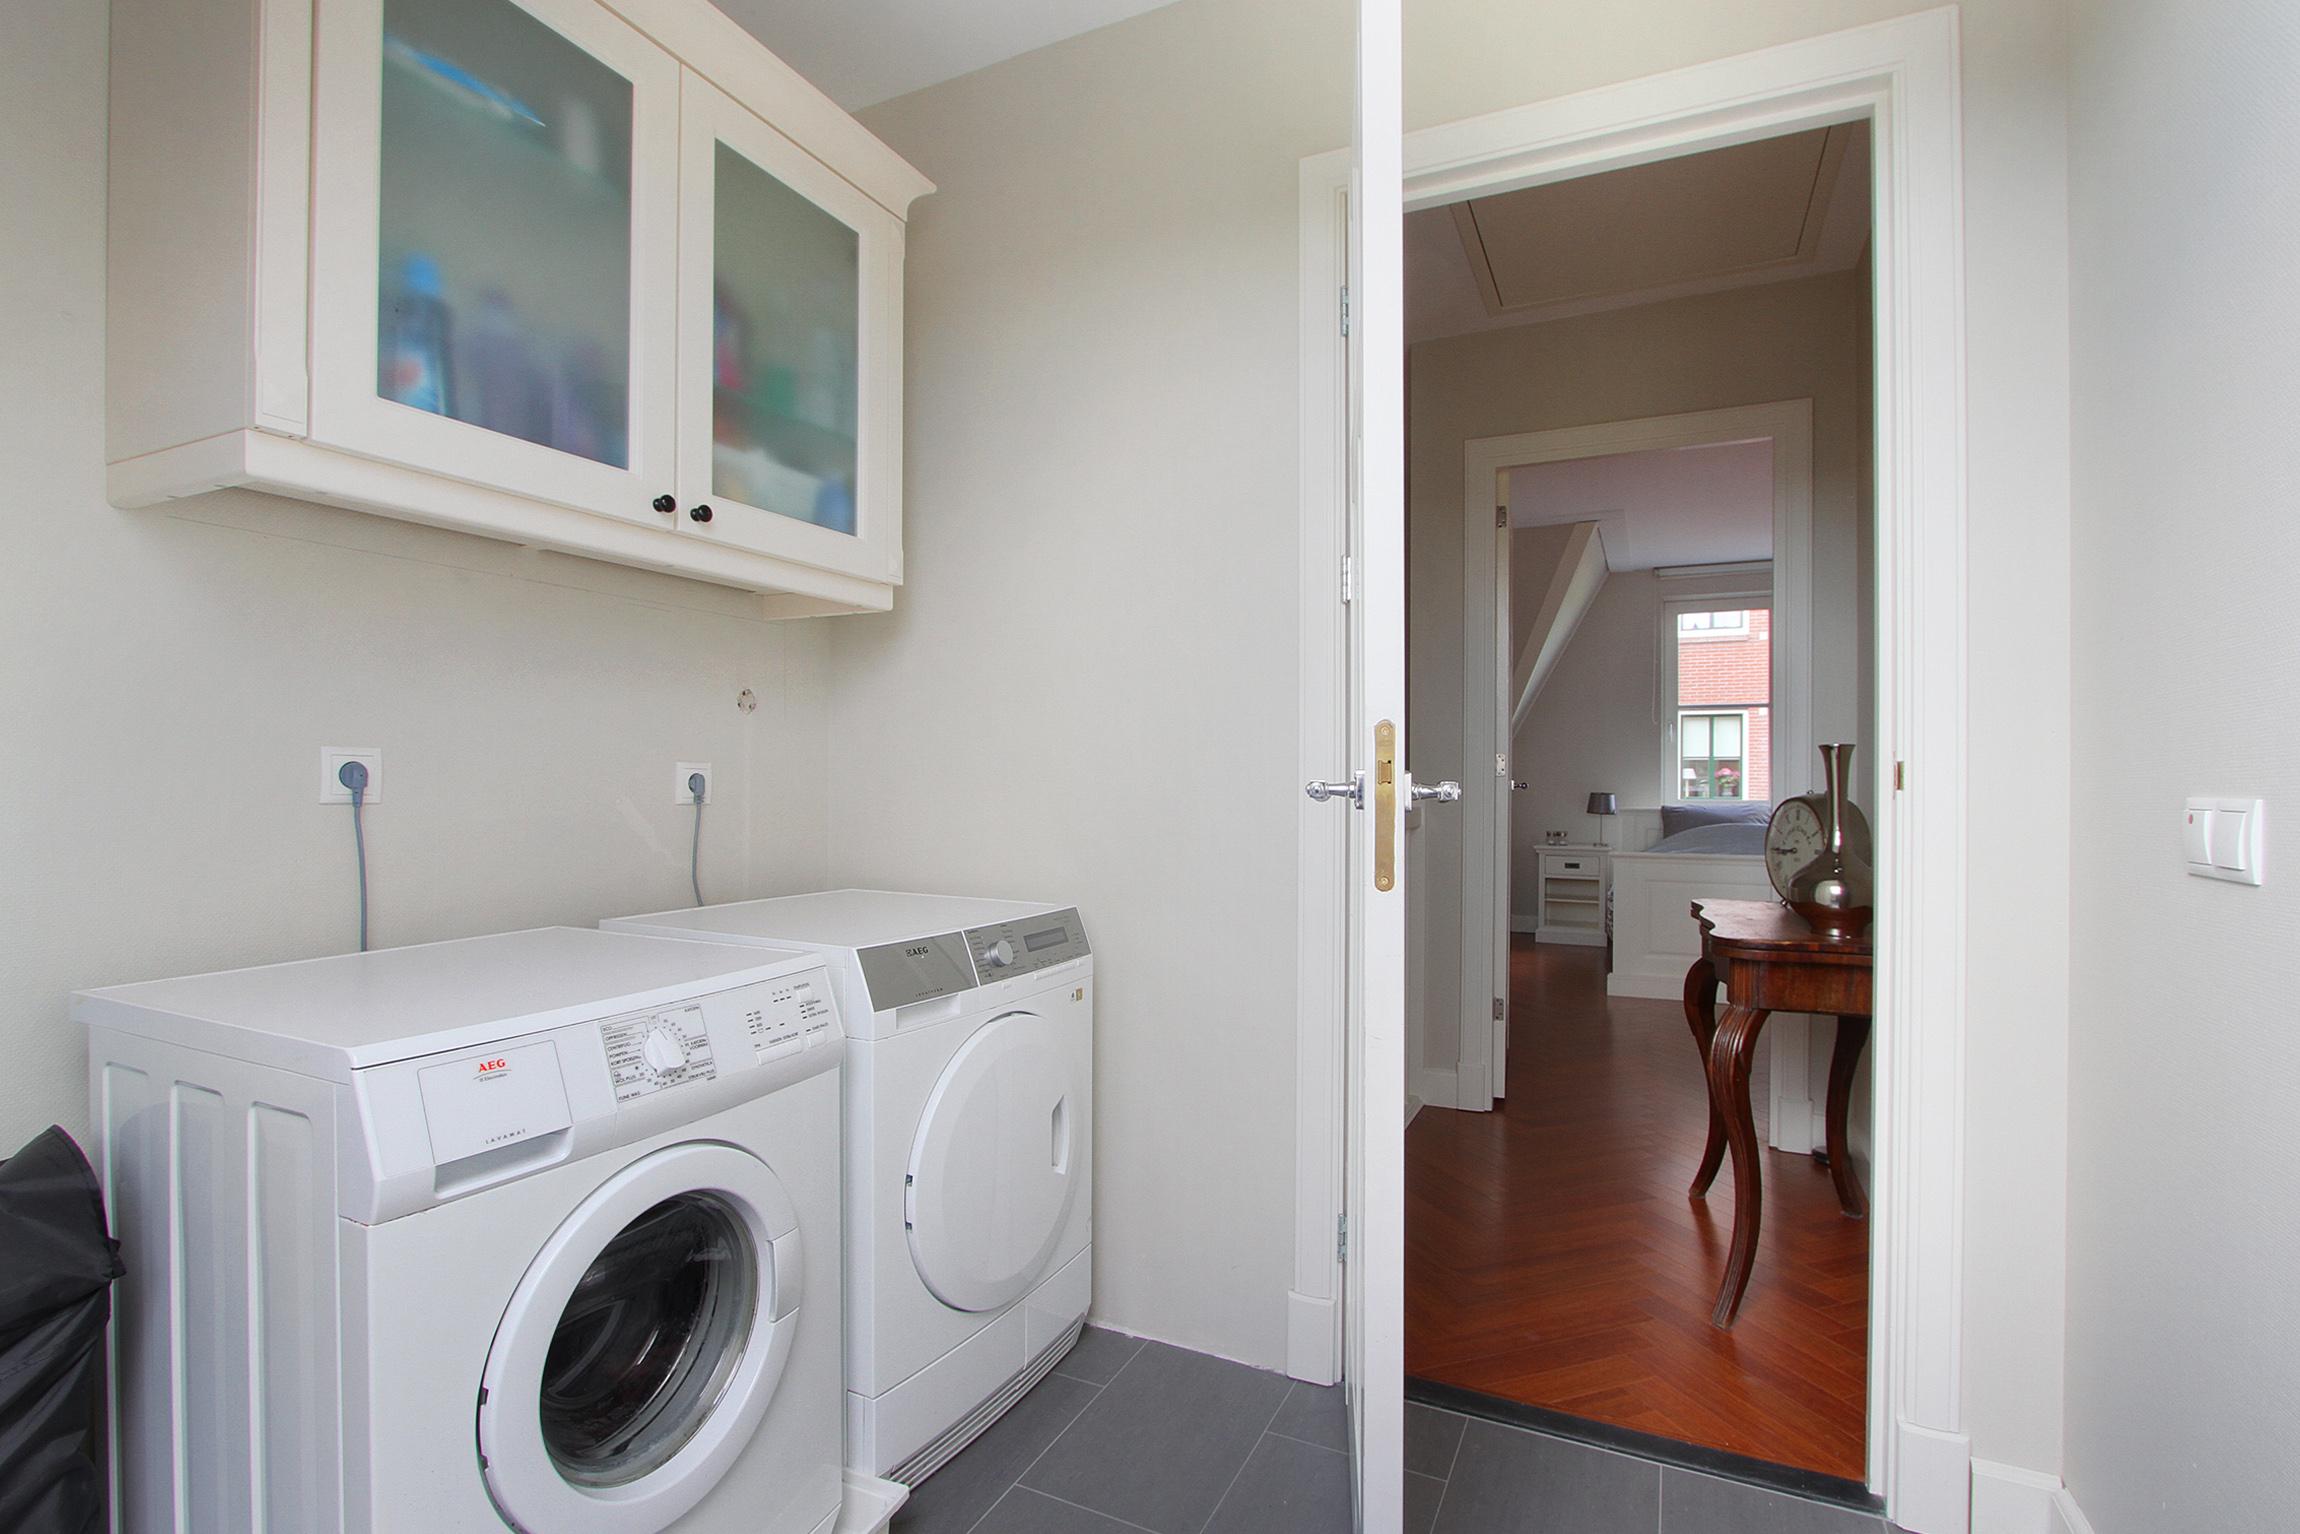 Design Keukens Heemskerk : Te koop: Steenhouwerskwartier 20, Heemskerk ...